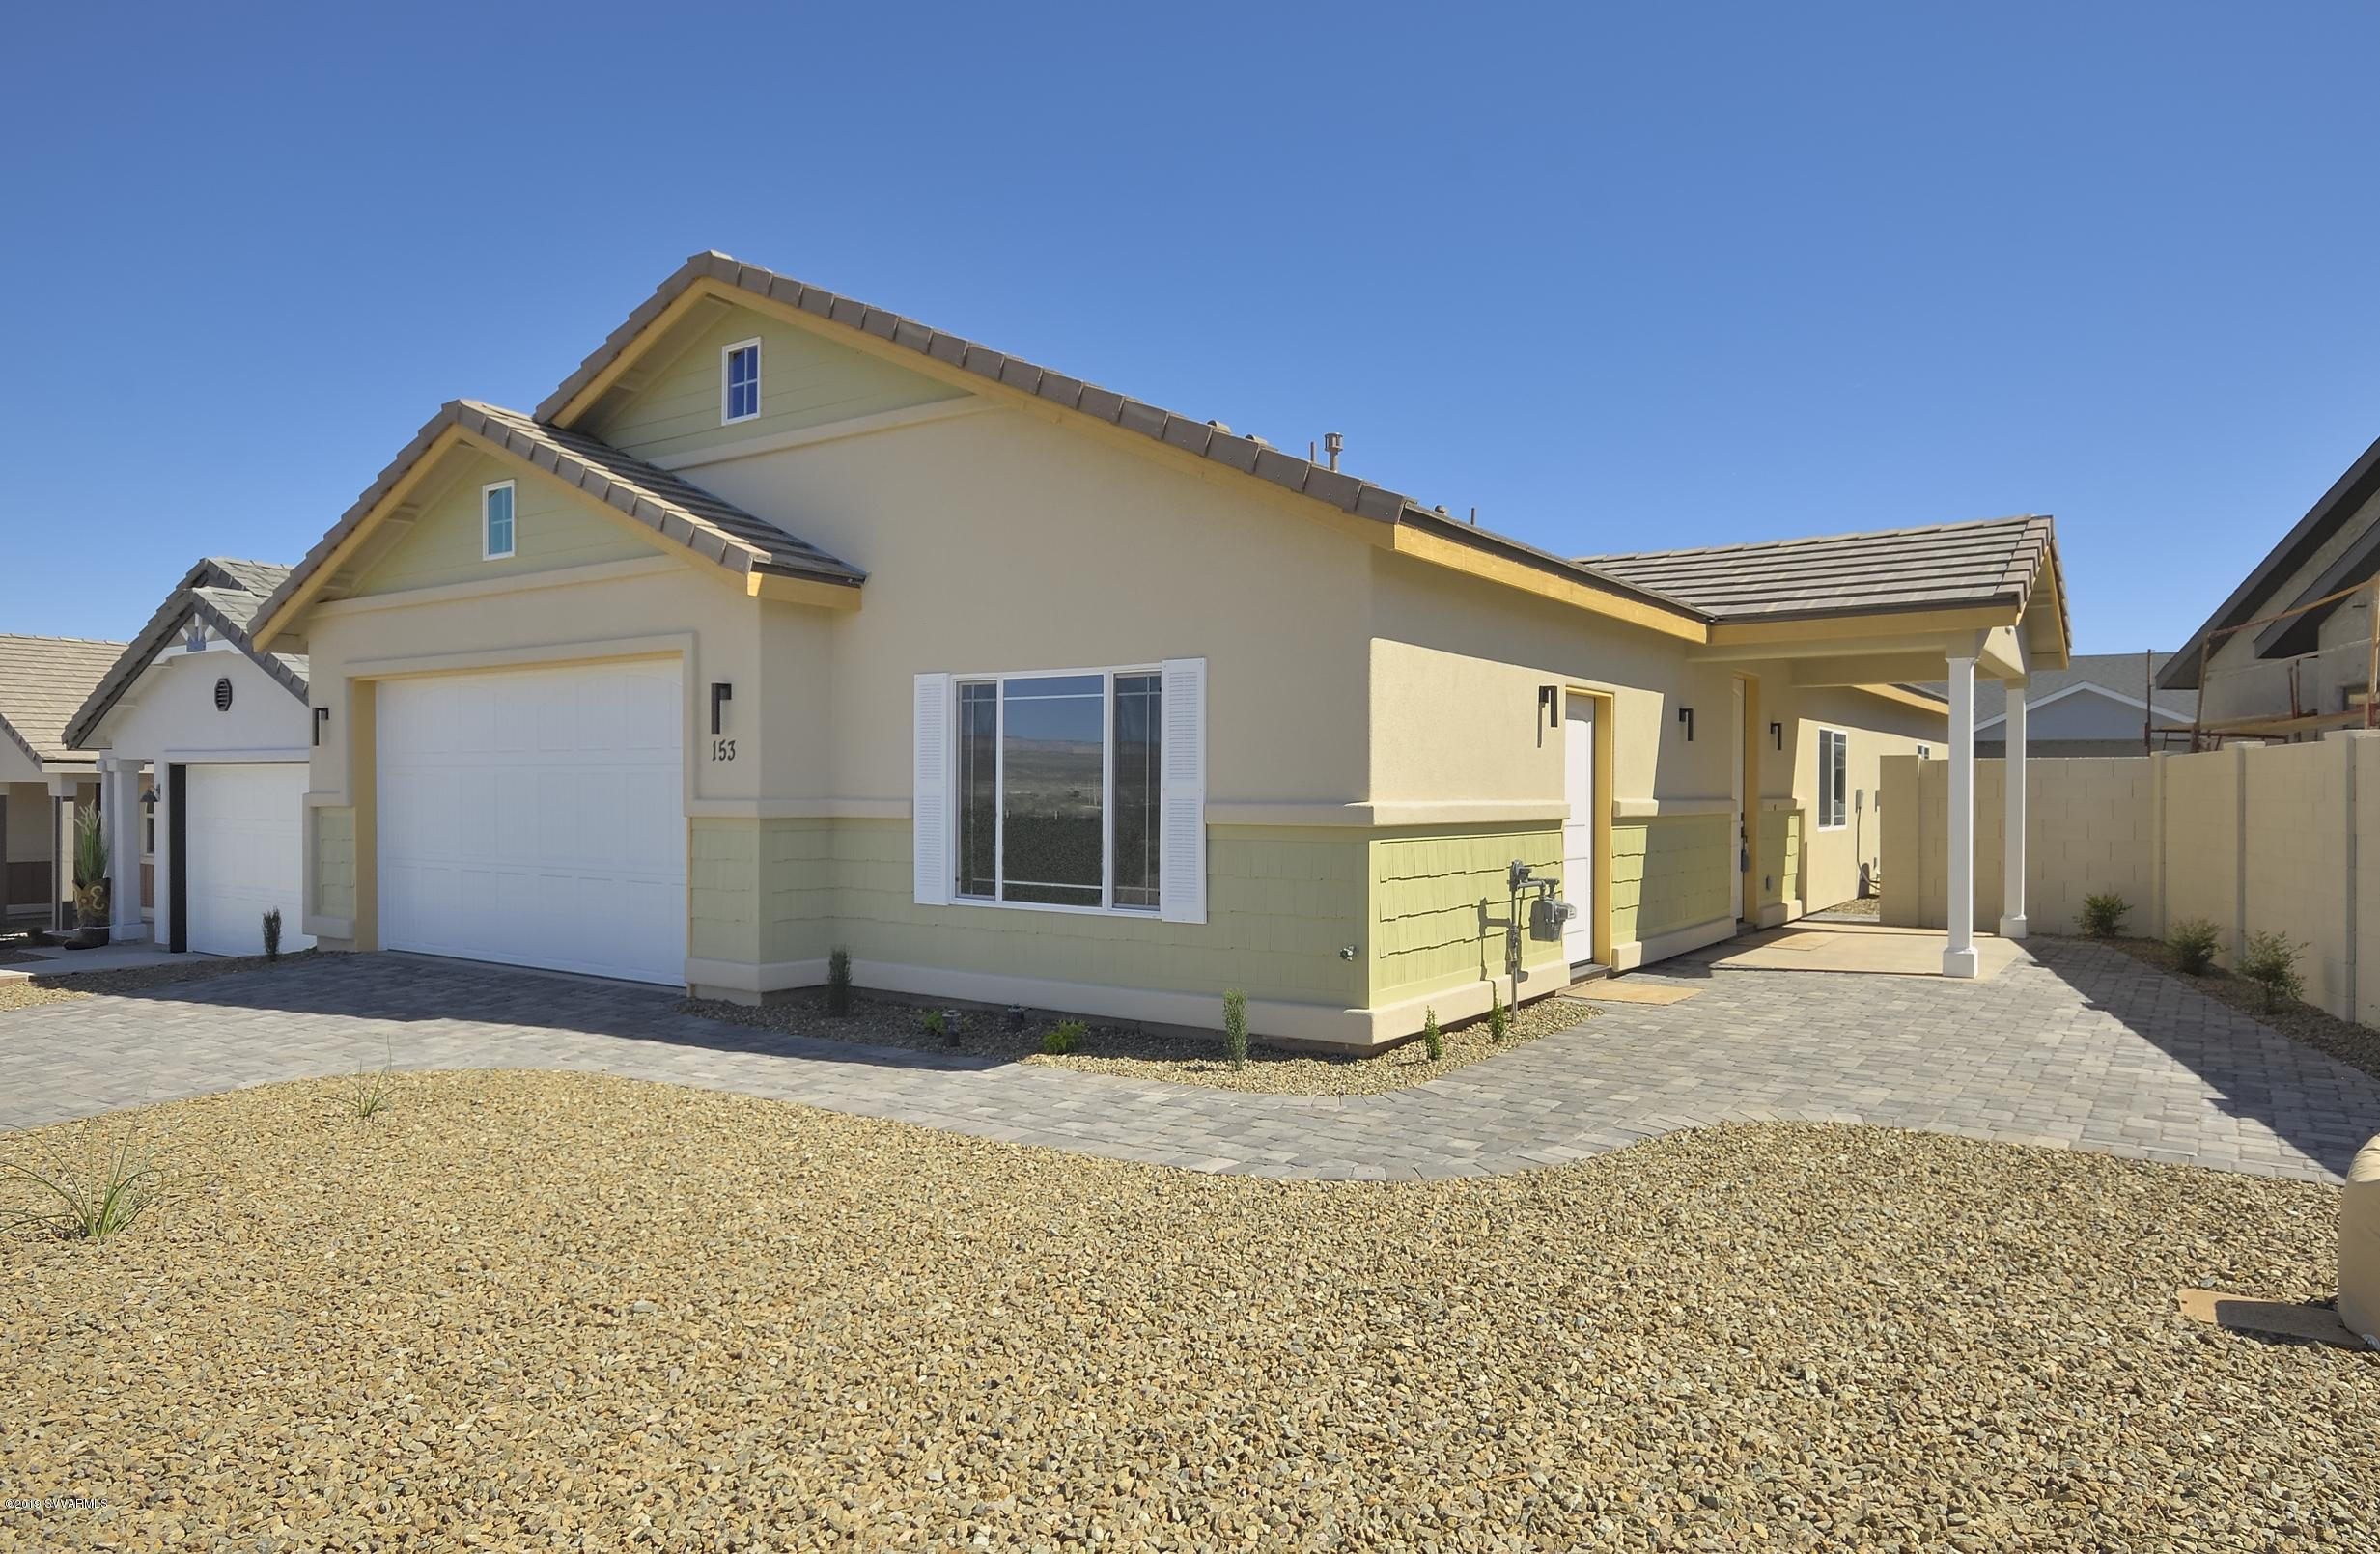 153 Granite Springs Rd Clarkdale, AZ 86324